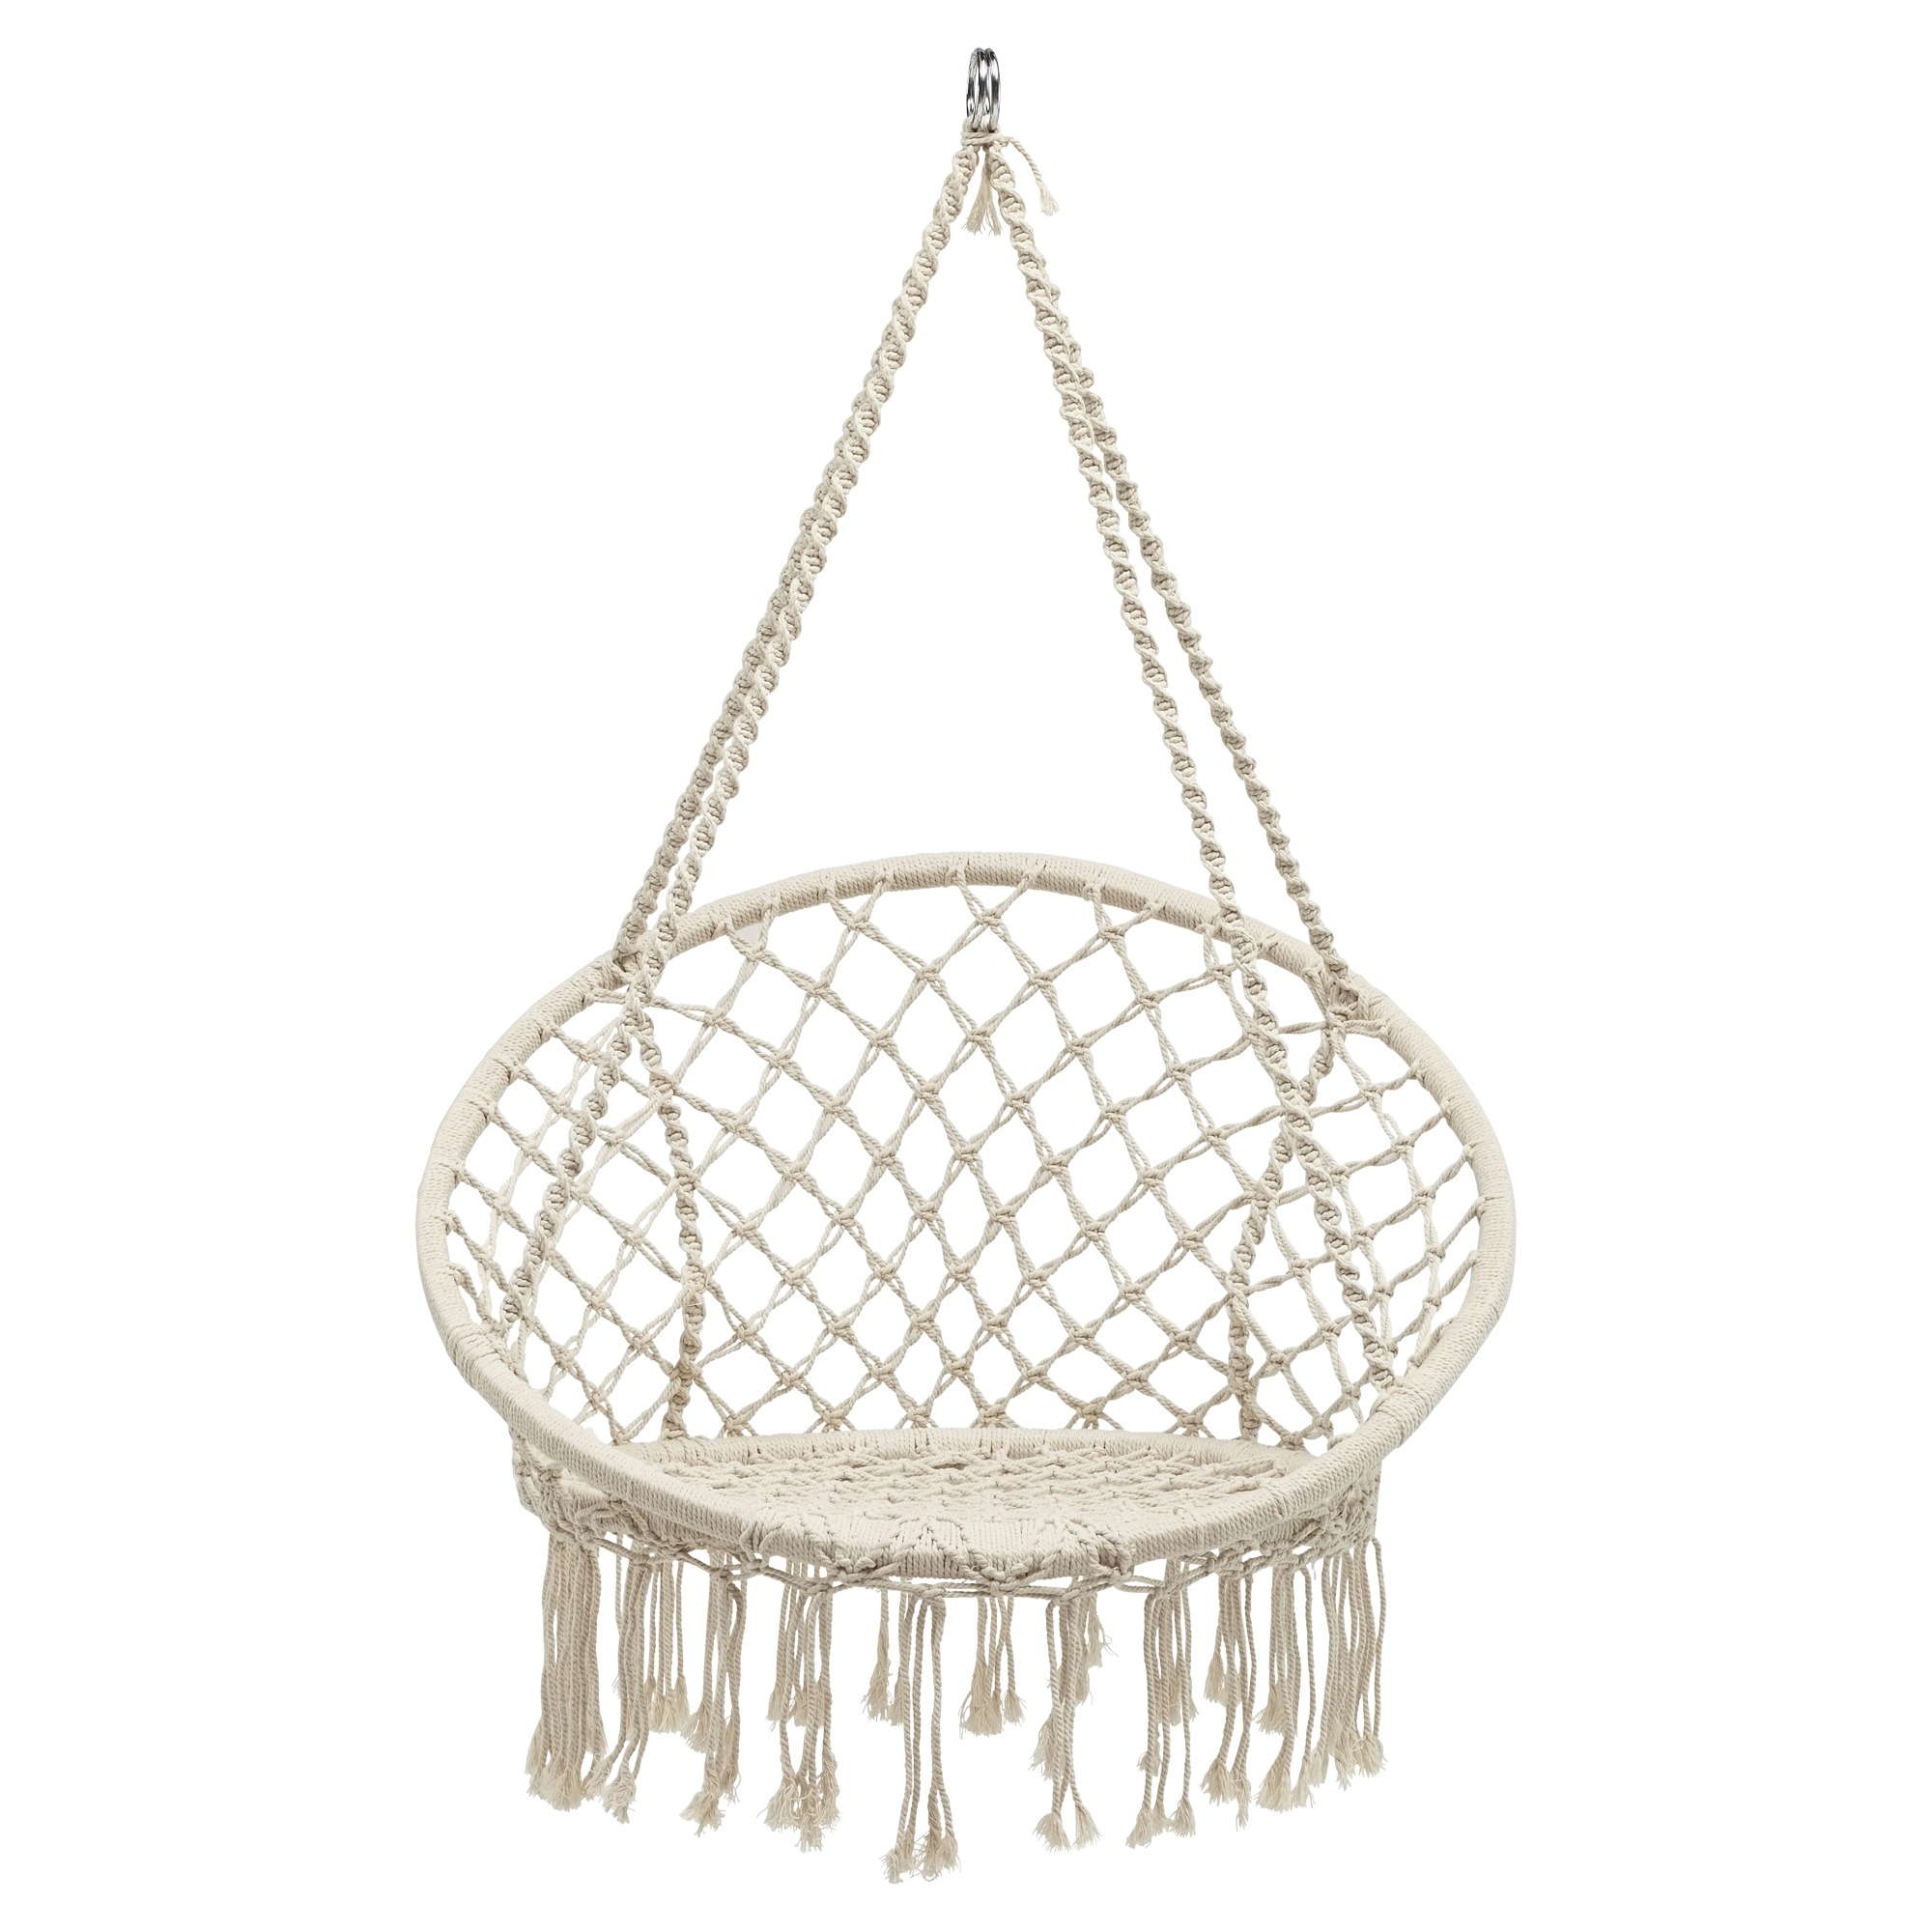 Hangstoel met franjes 118x80x80 cm   Tuinstoelen   Tuinmeubelen   Tuin   KARWEI